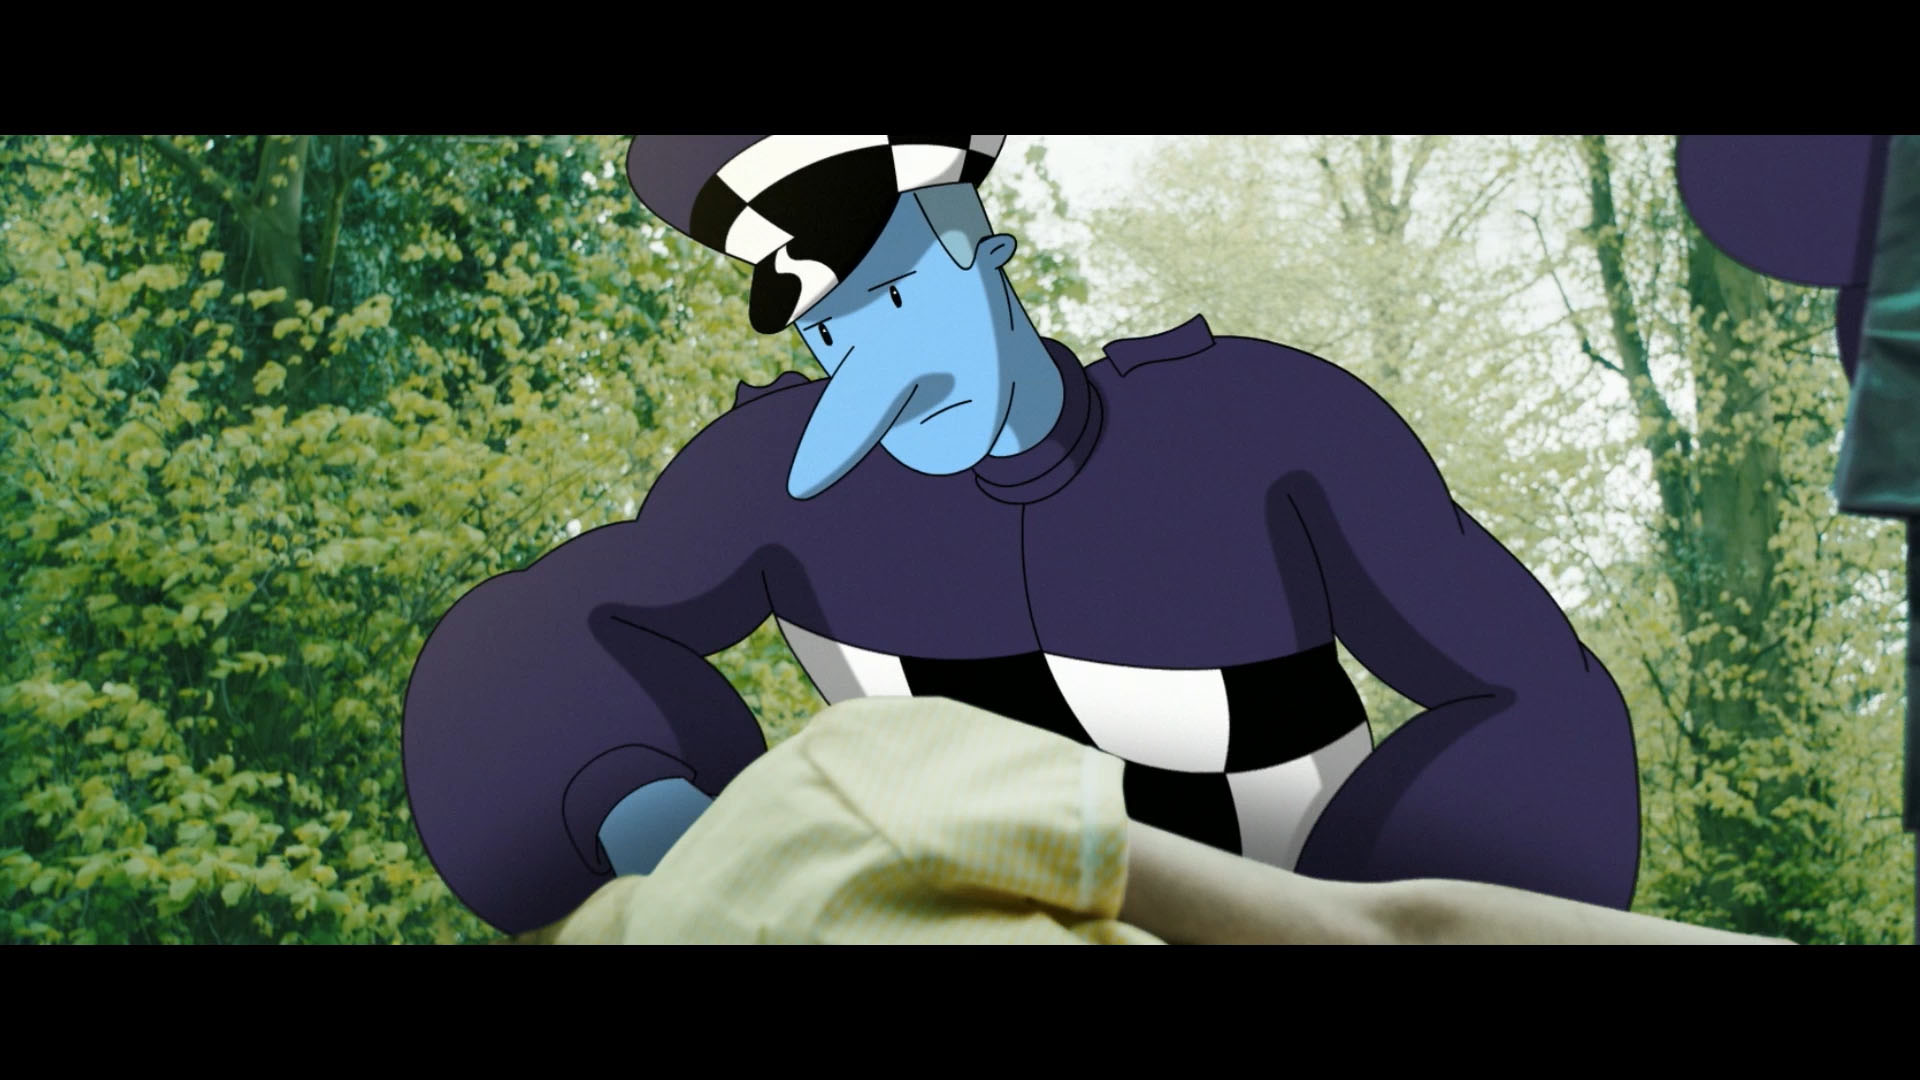 Police-web-12-02-18